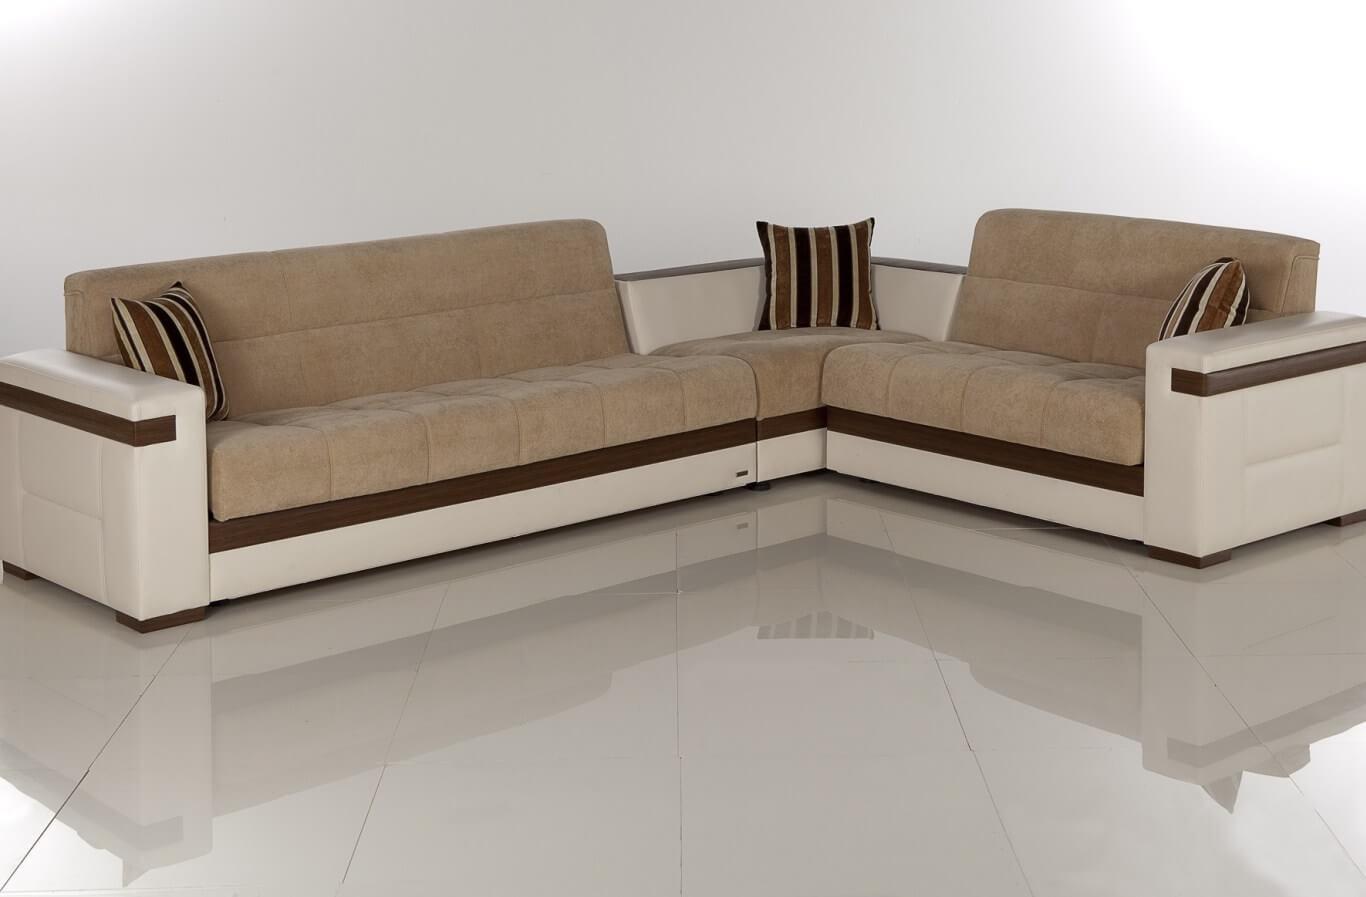 Wonderful Sleeper Sofas Ideas Hiding Cozy Furniture To For Felton Modern Style Pullout Sleeper Sofas Black (View 1 of 15)